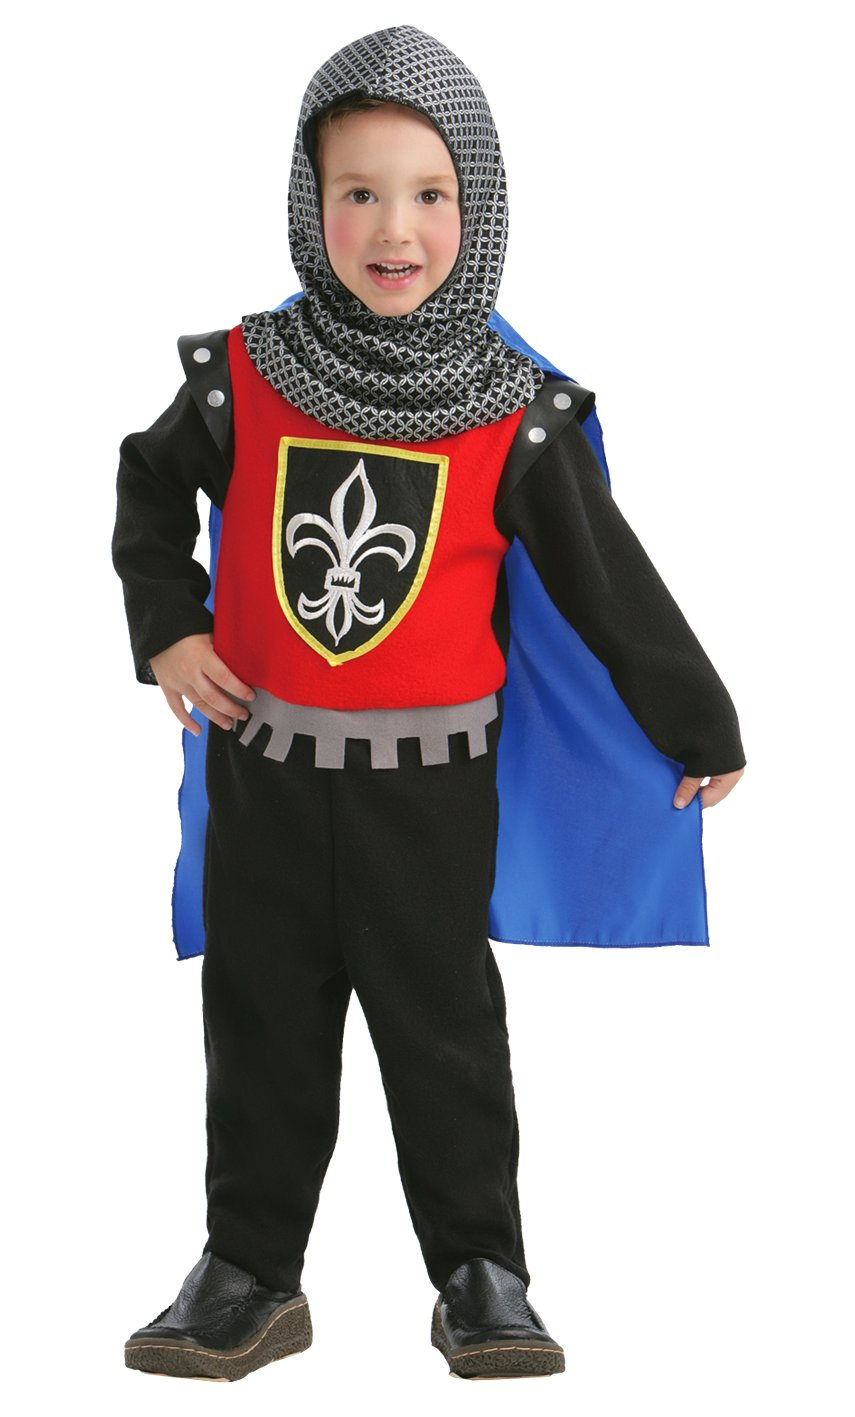 Costume-Chevalier-Garçon-4A